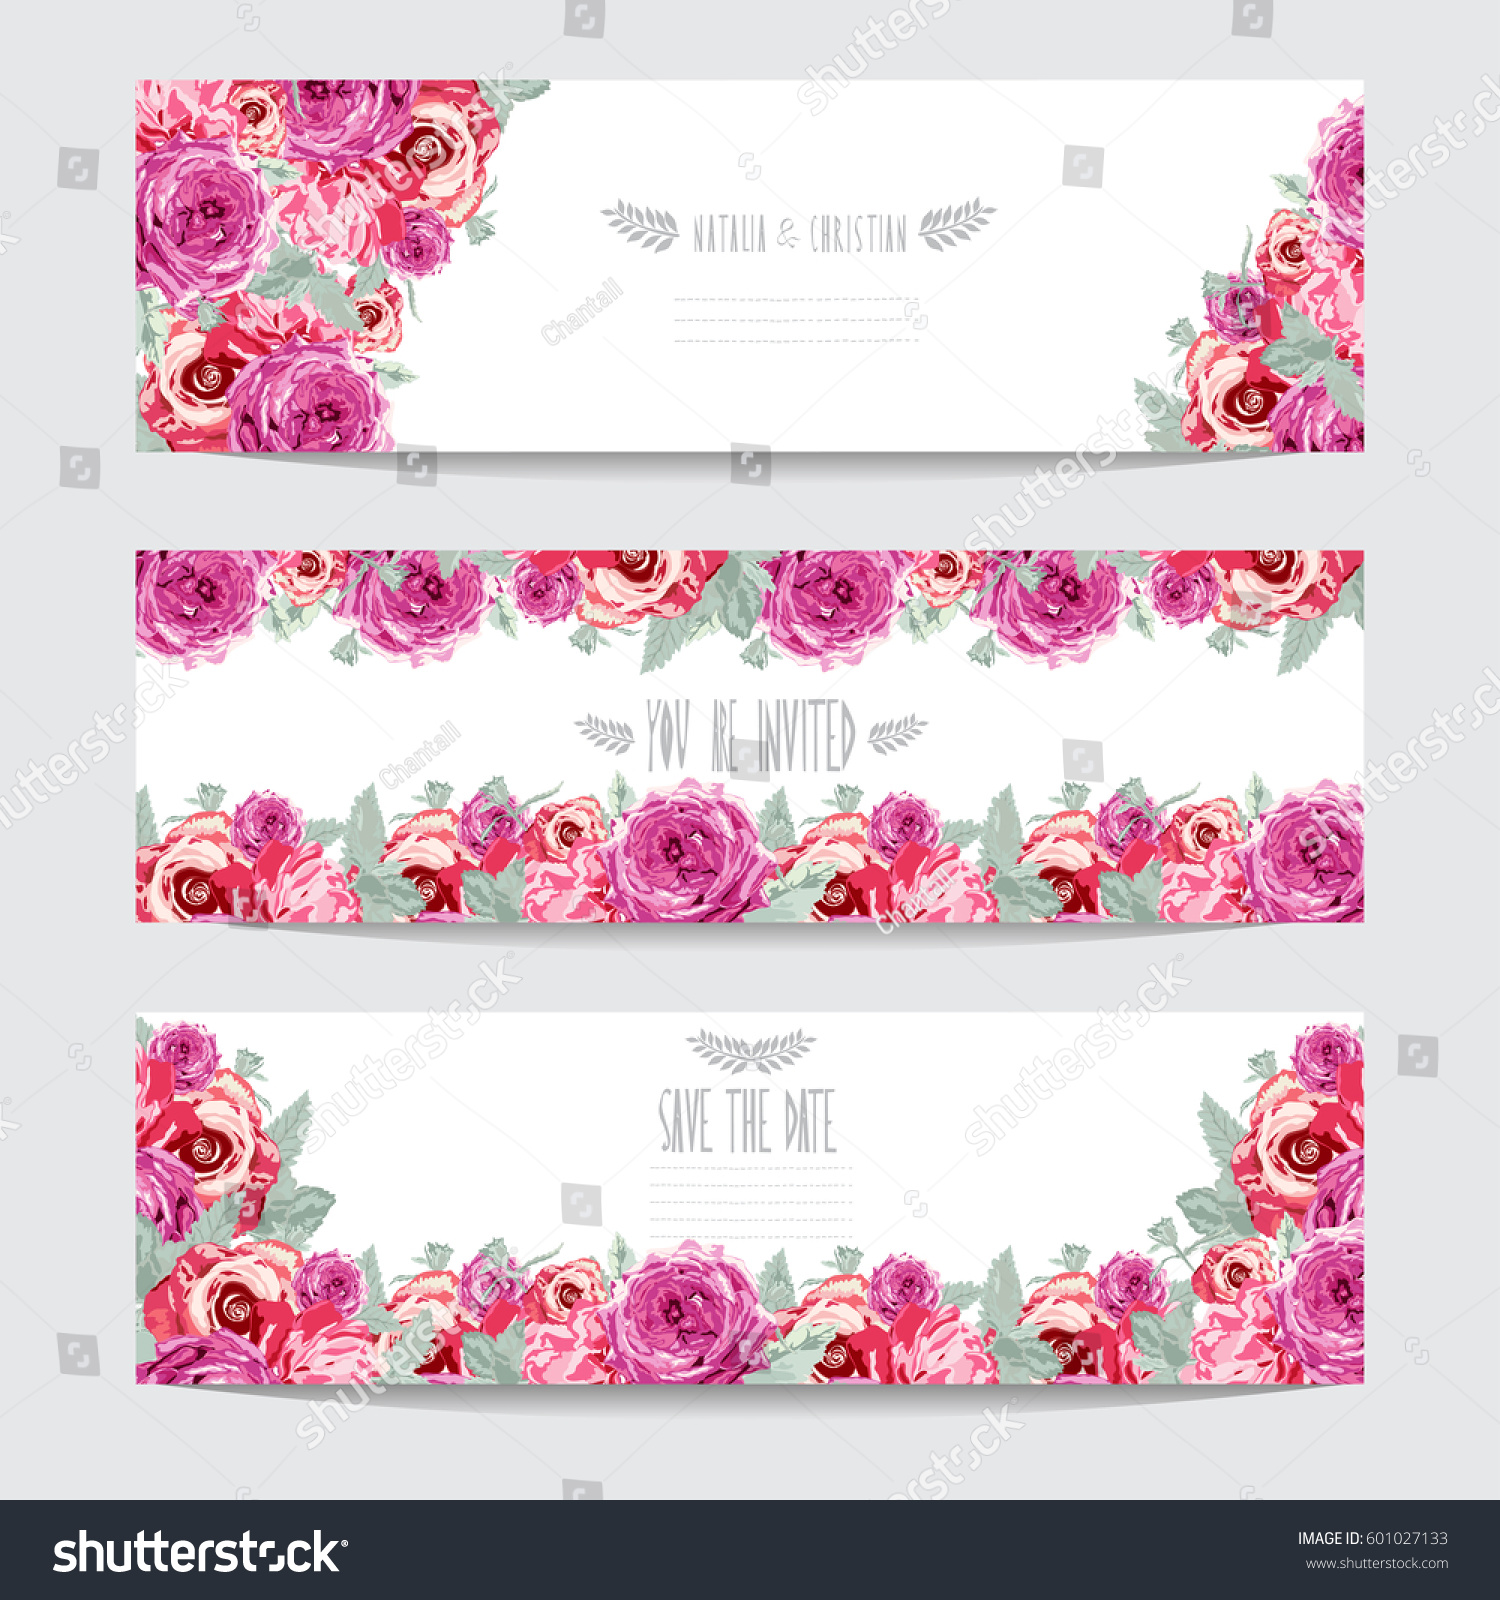 Royalty Free Stock Illustration Of Elegant Cards Decorative Rose